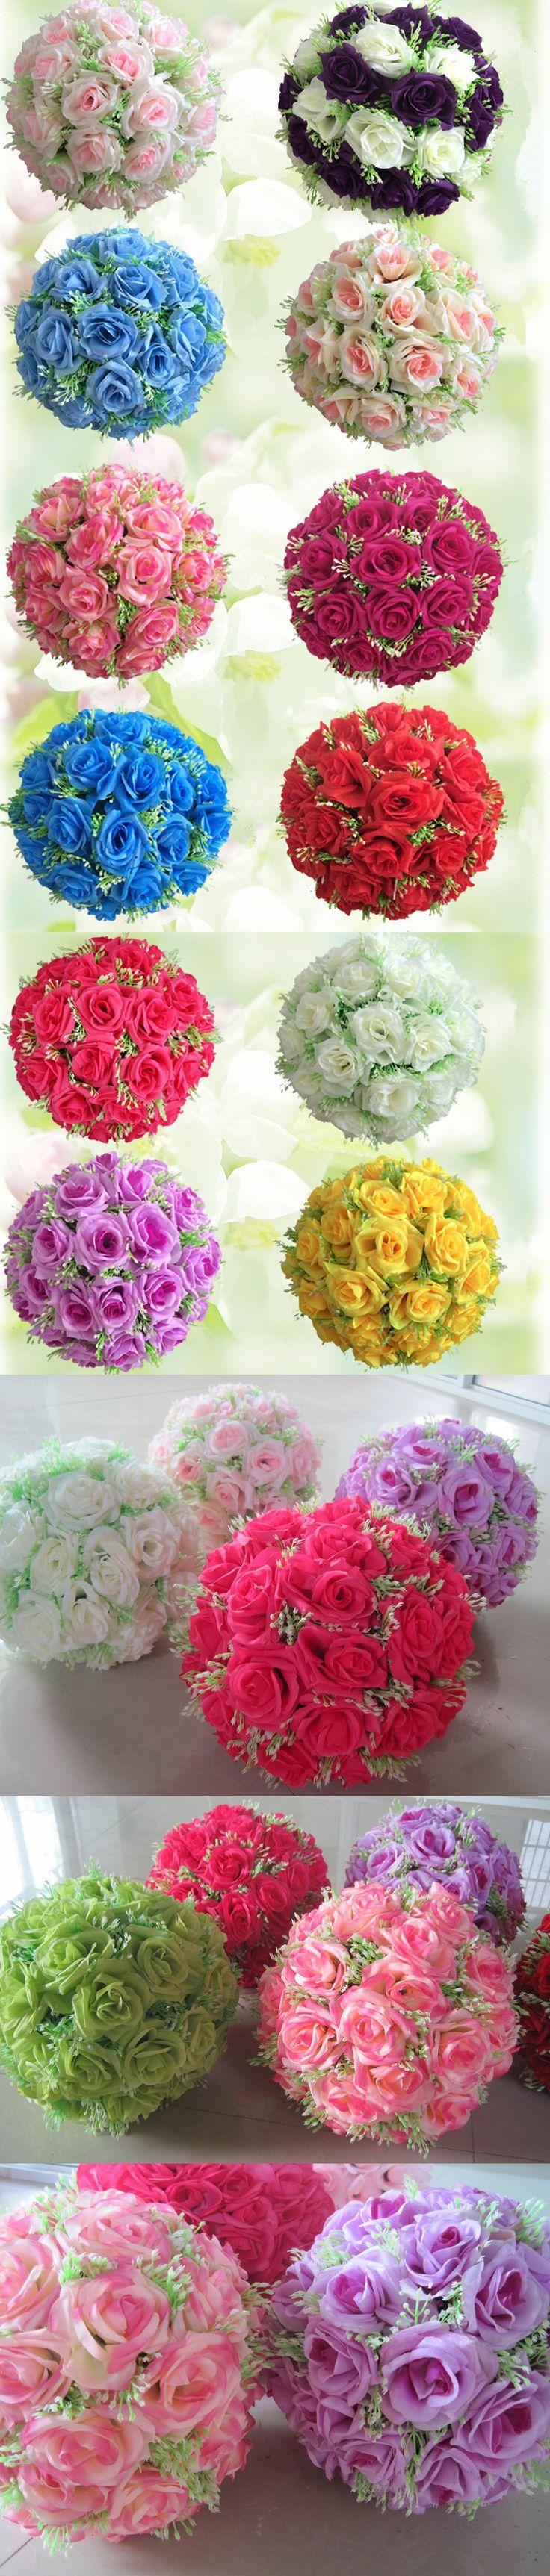 wedding centerpieces fake flowers%0A   inch    cm  Silk Flower Kissing Balls Romantic Flower Ball Centerpieces  New Hanging Flower Balls